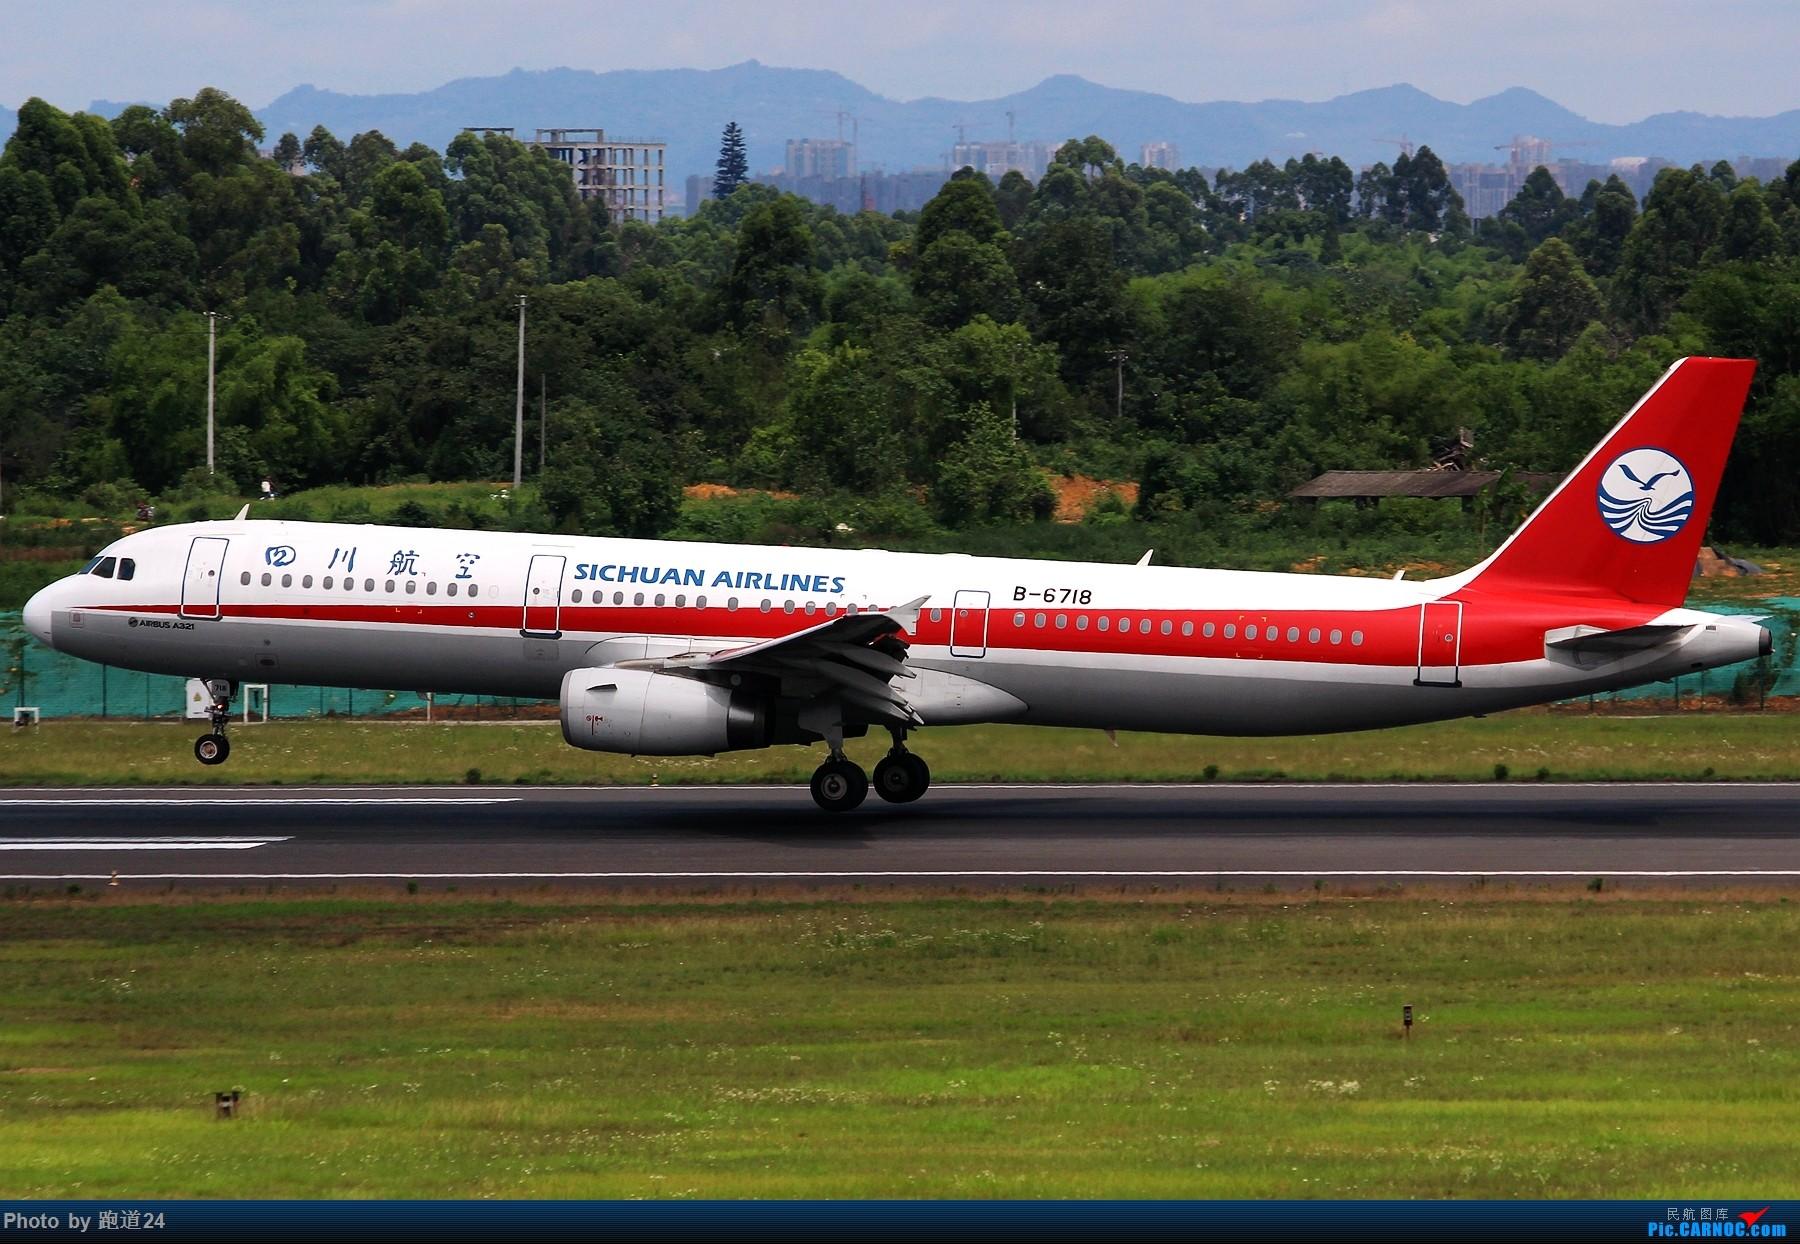 Re:[原创]【多图党】6月18日成都拍机【埃塞俄比亚航空B777-200LR】 AIRBUS A320-200 B-6718 中国成都双流国际机场